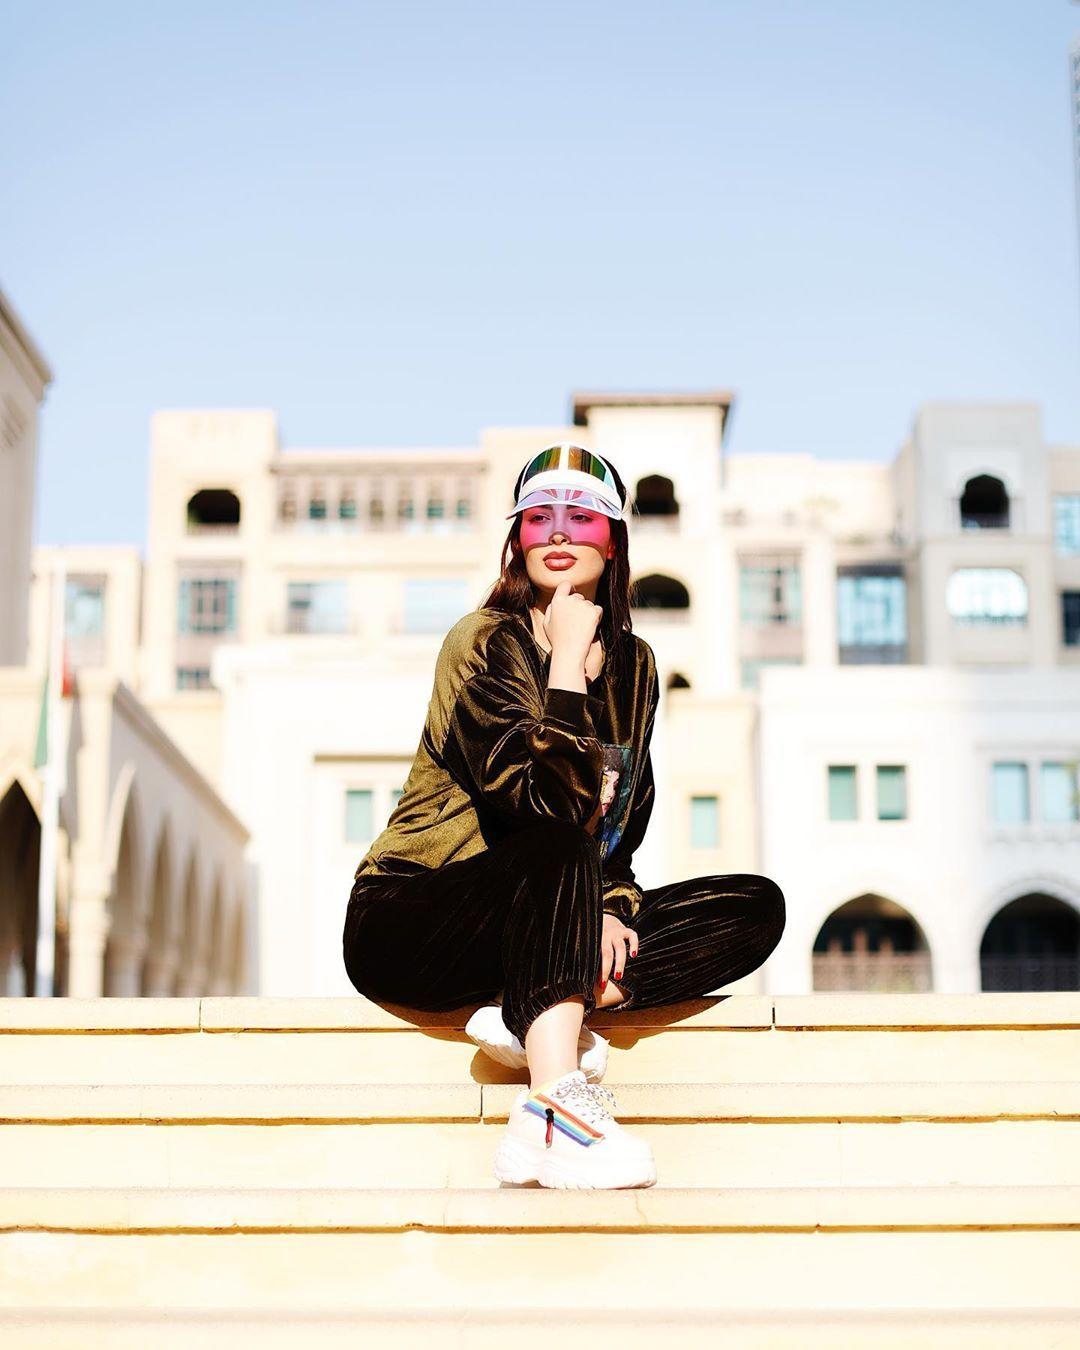 Rawan Bin Hussain روان بن حسين On Instagram New Year New Wardrobe سنه جديده ملابس جديده Shop At Shein Ar Using My Discou Fashion Style Hipster